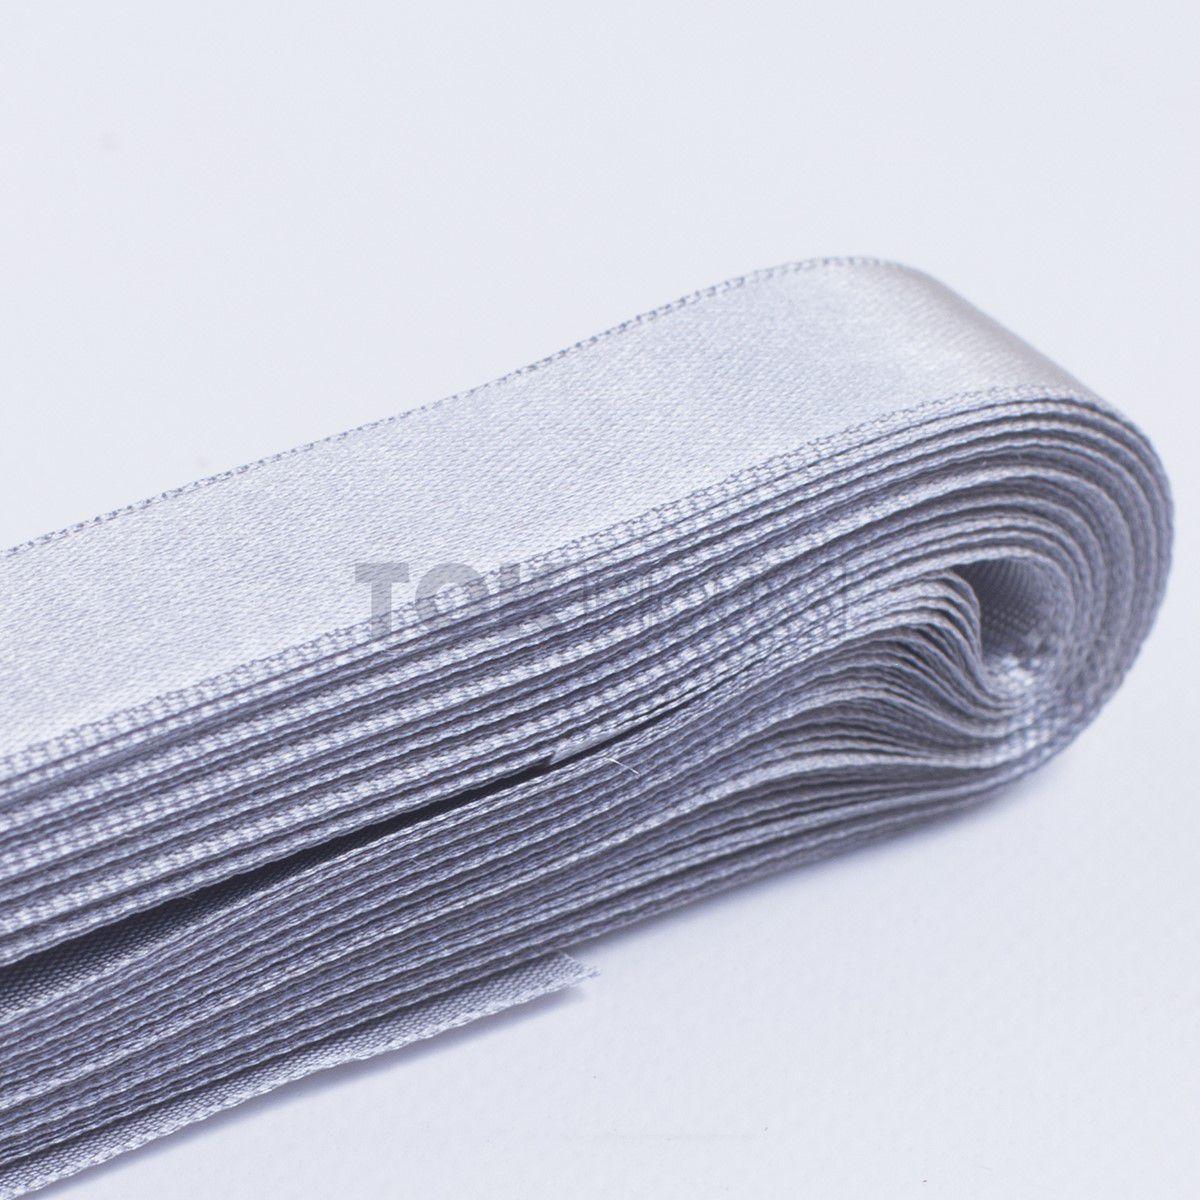 Fita Cetim N.1 - 7mm - 10 Metros - COR (24) Prata